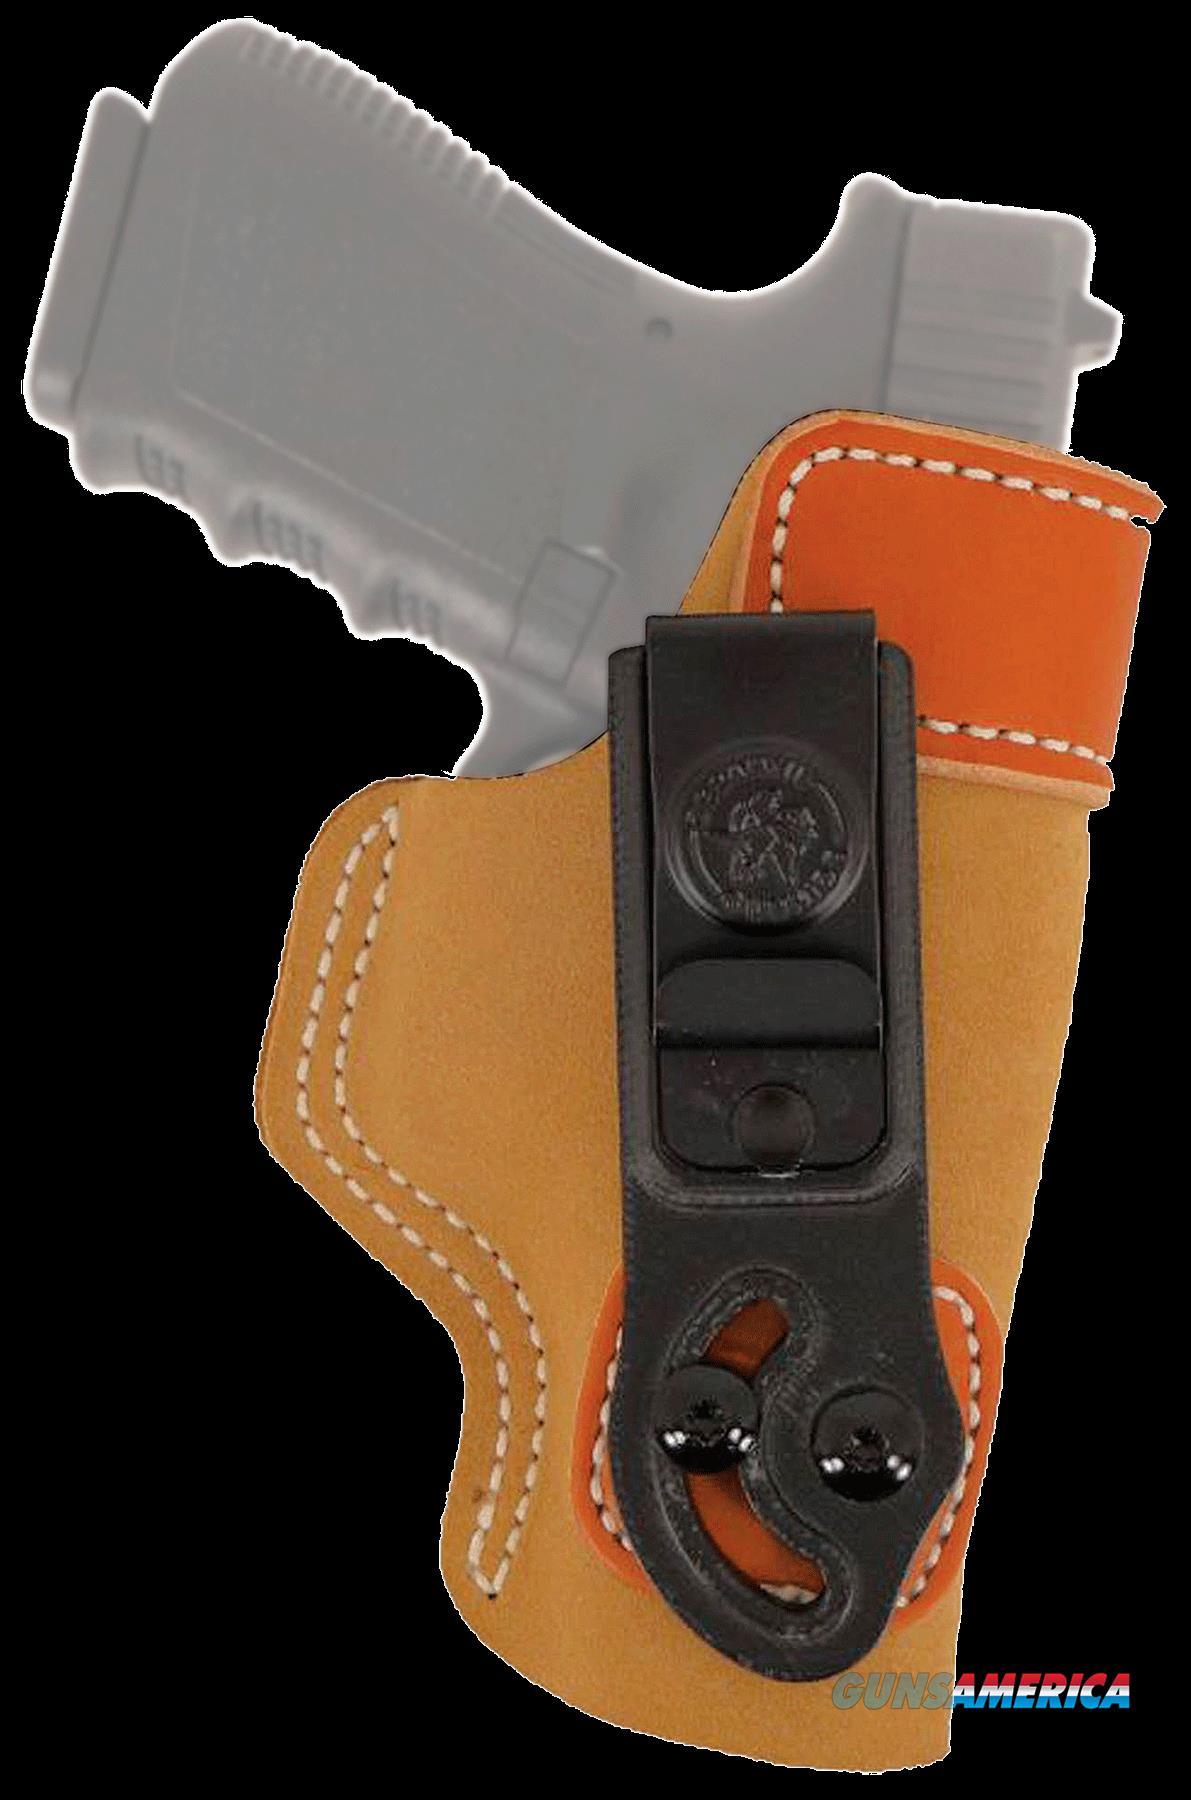 Desantis Gunhide Sof-tuck, Des 106nax3z0 106 Sof Tuk  Guns > Pistols > 1911 Pistol Copies (non-Colt)